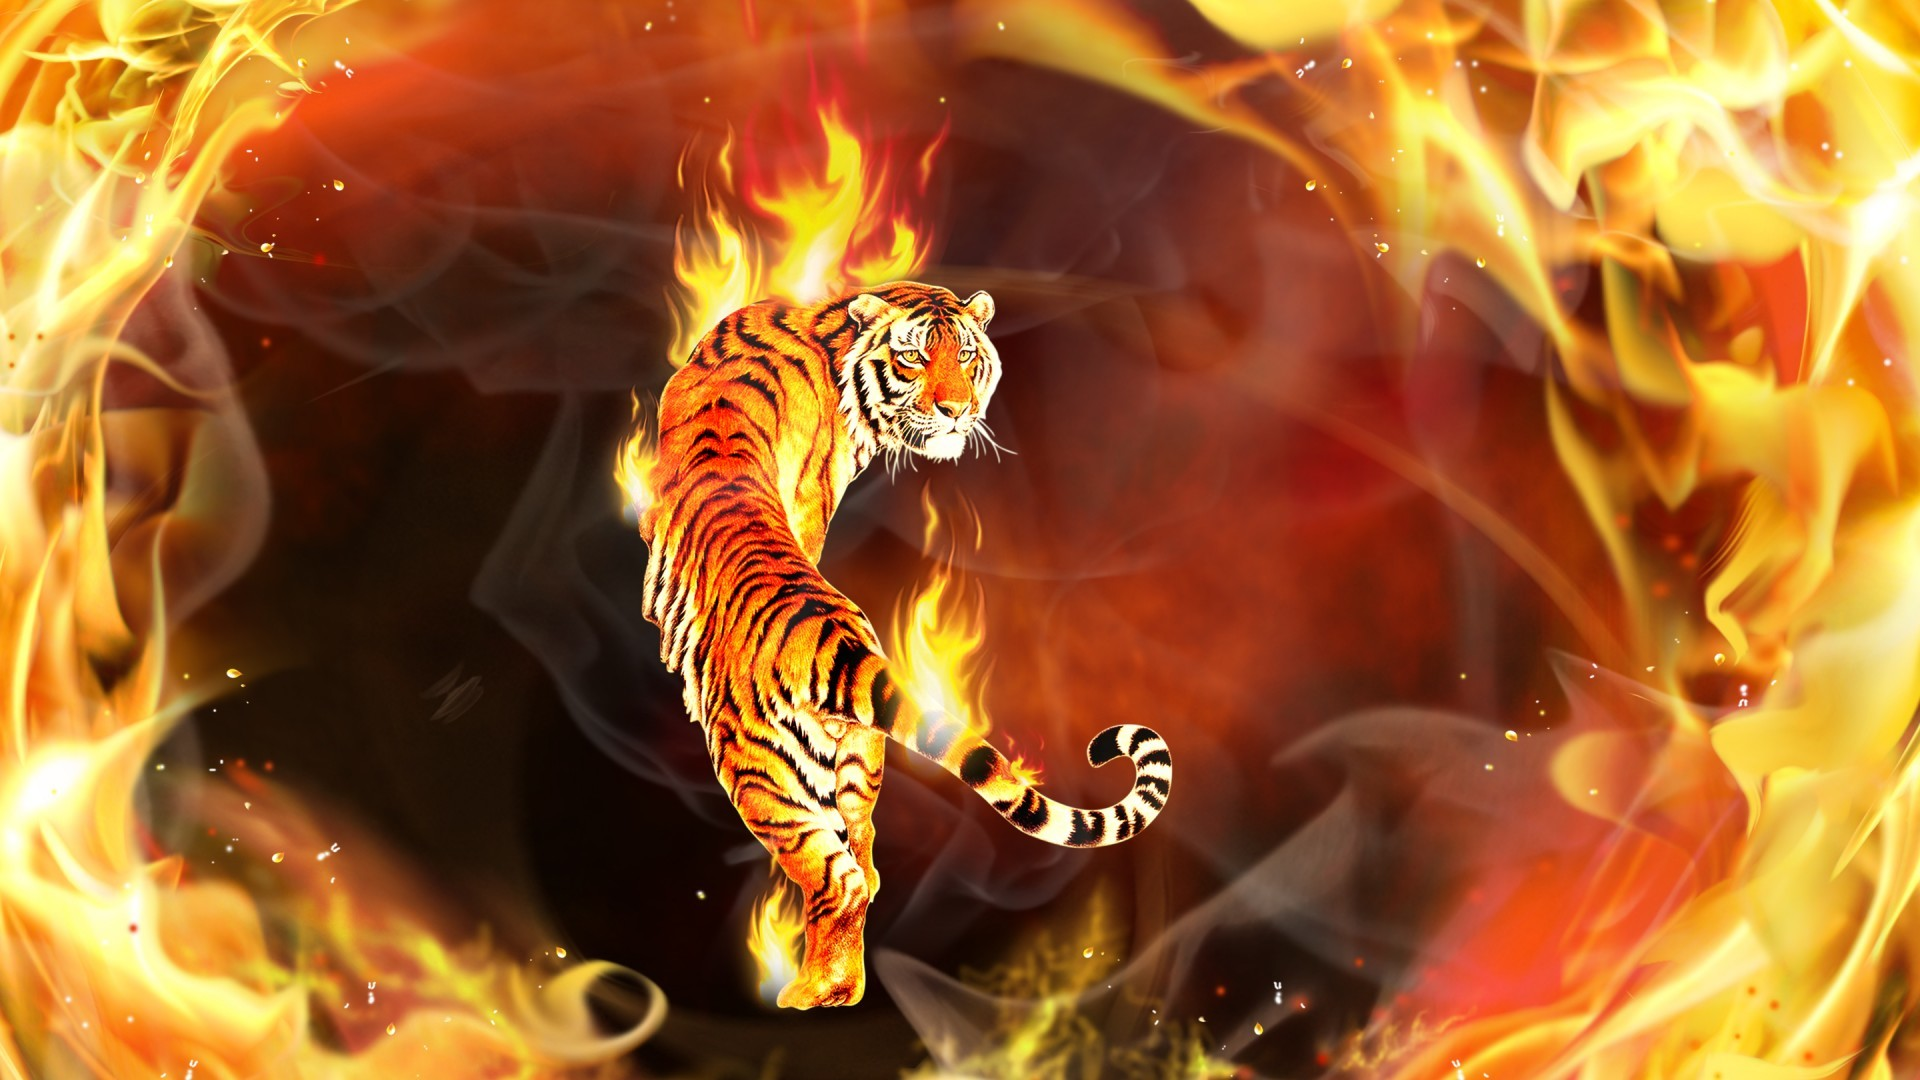 Flame Animals, Fire Tiger 02 Jpg, Animal Wallpaper, Fire Flames, 7015694  Tiger On Fire Jpg Fire Wallpapers